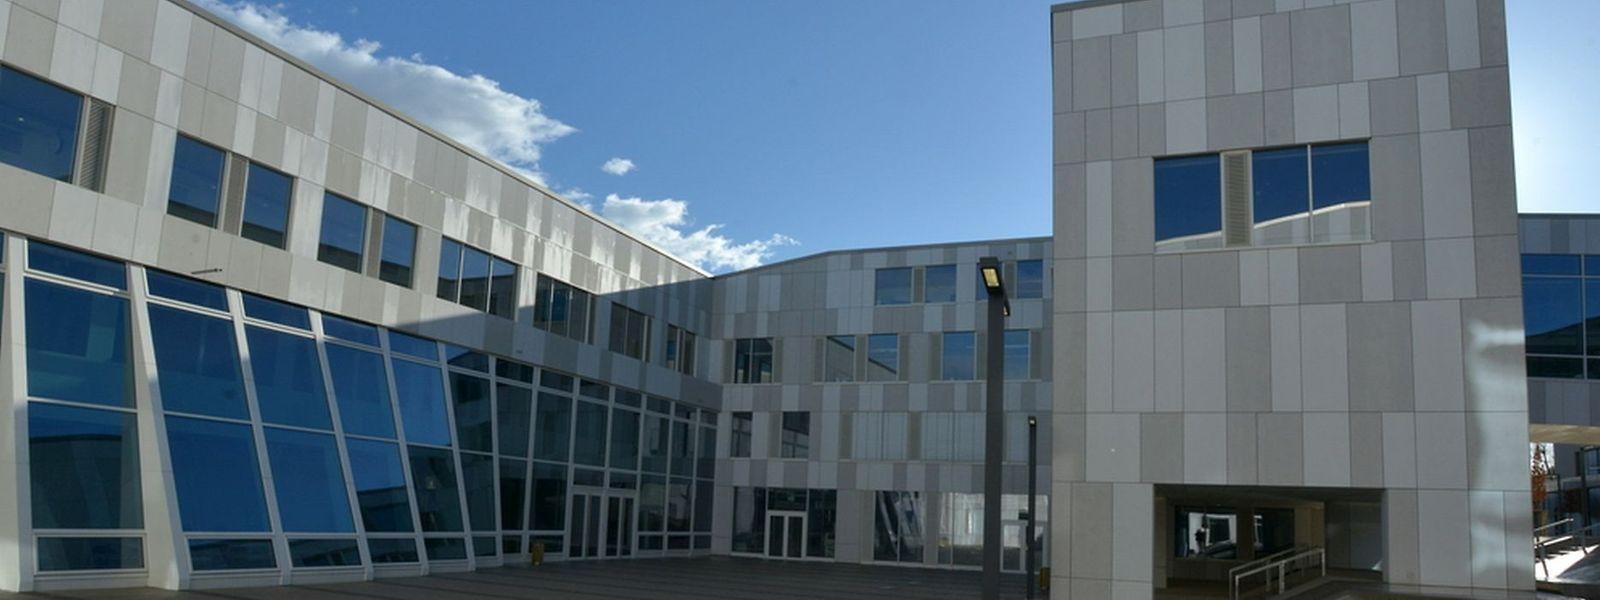 Im neuen Gebäudekomplex des Maacher Lycée werden momentan über 900 Schüler unterrichtet.